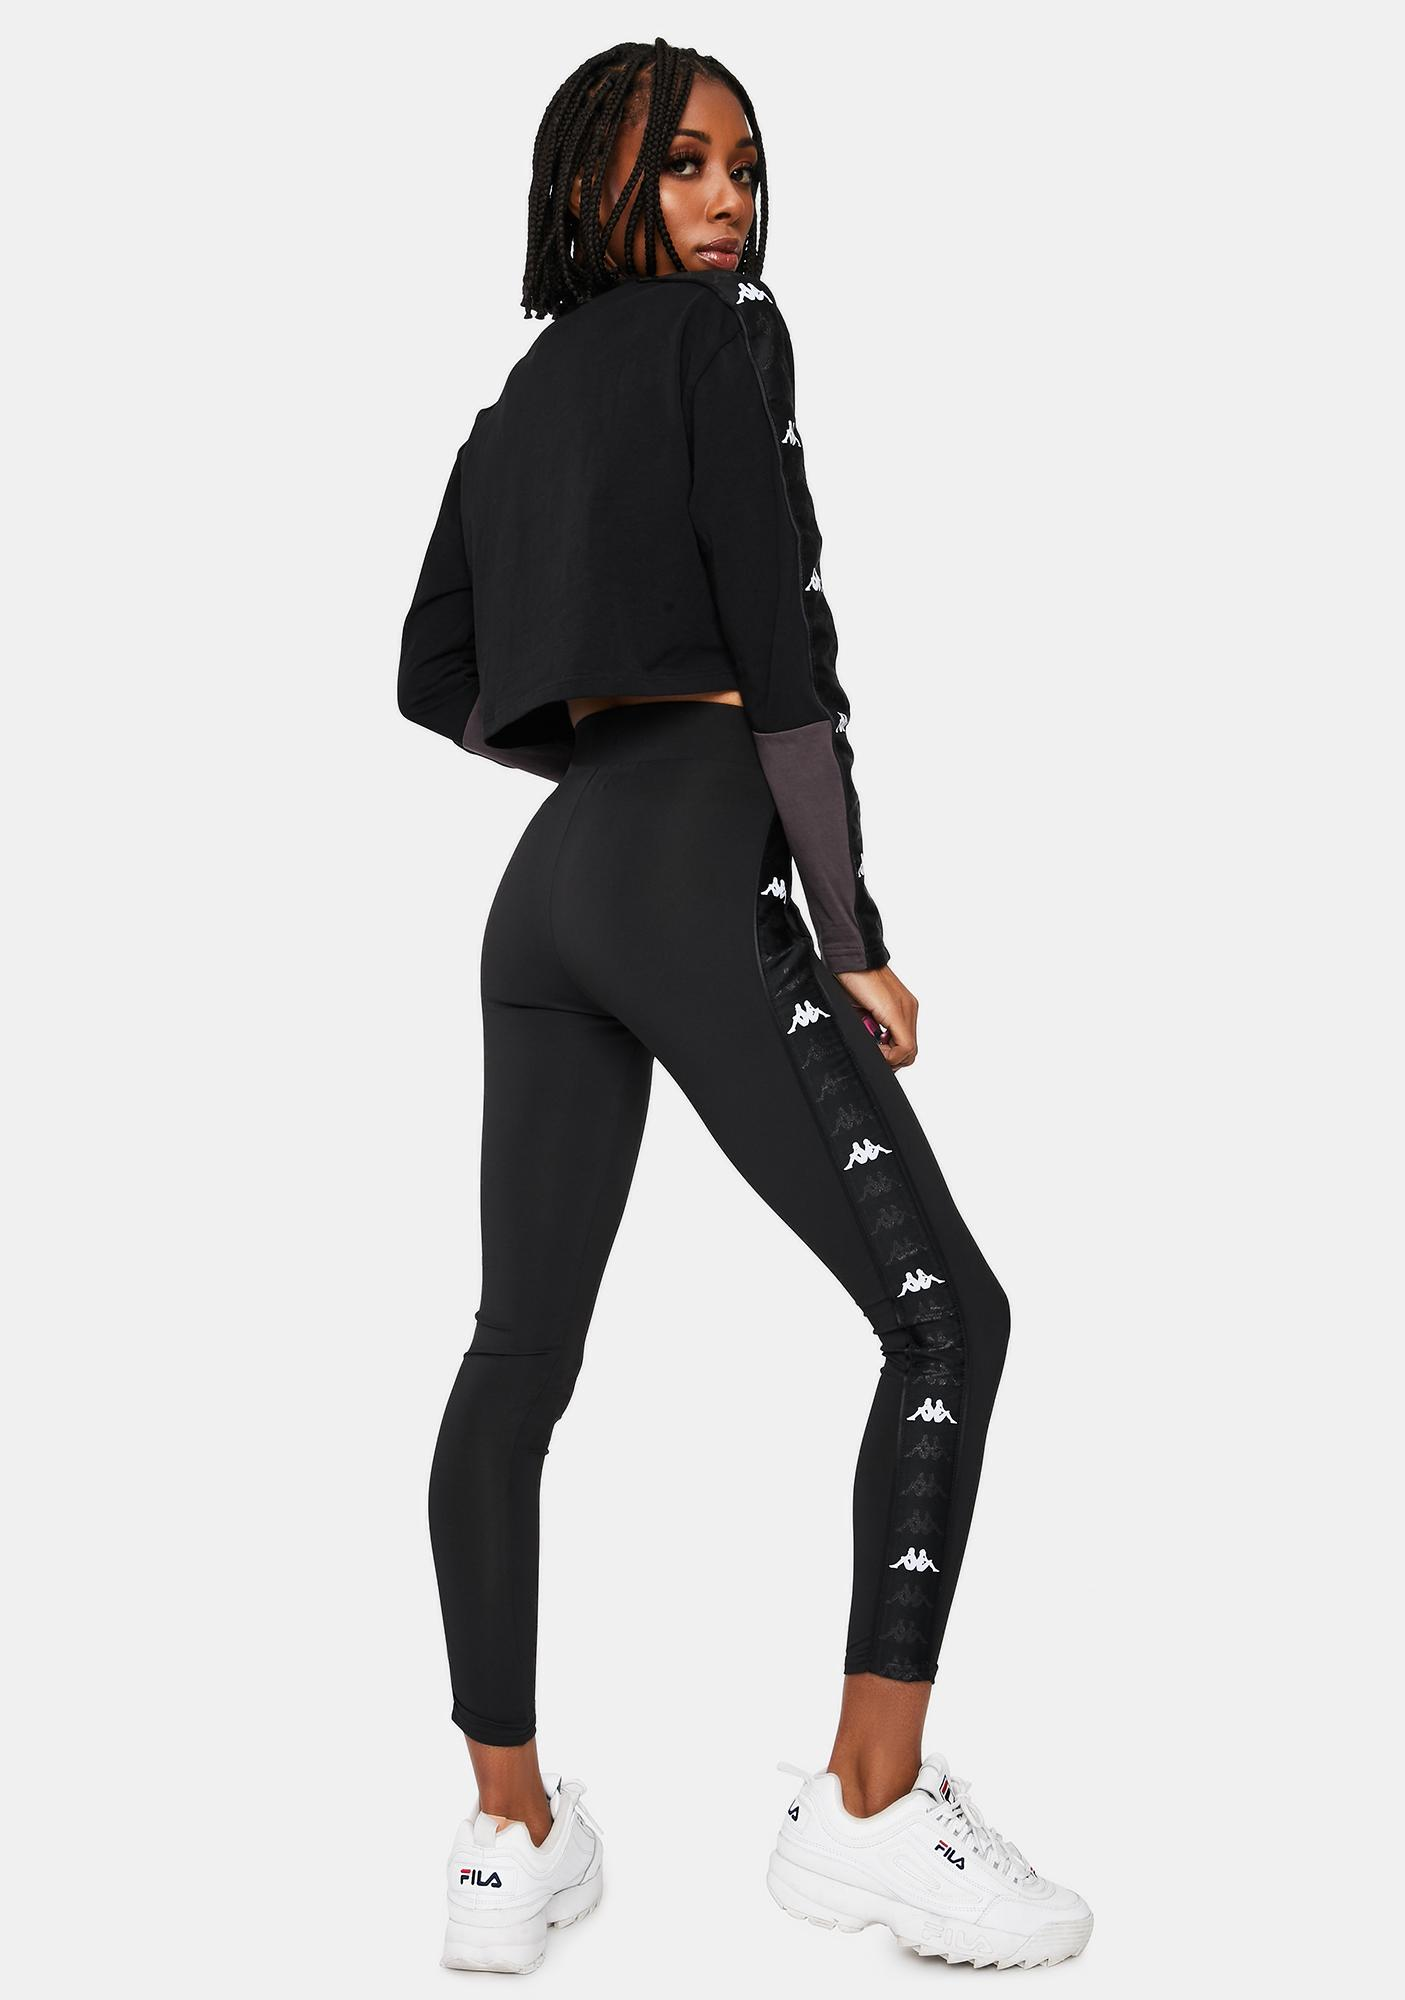 Kappa Black 222 Banda Barter Sport Leggings